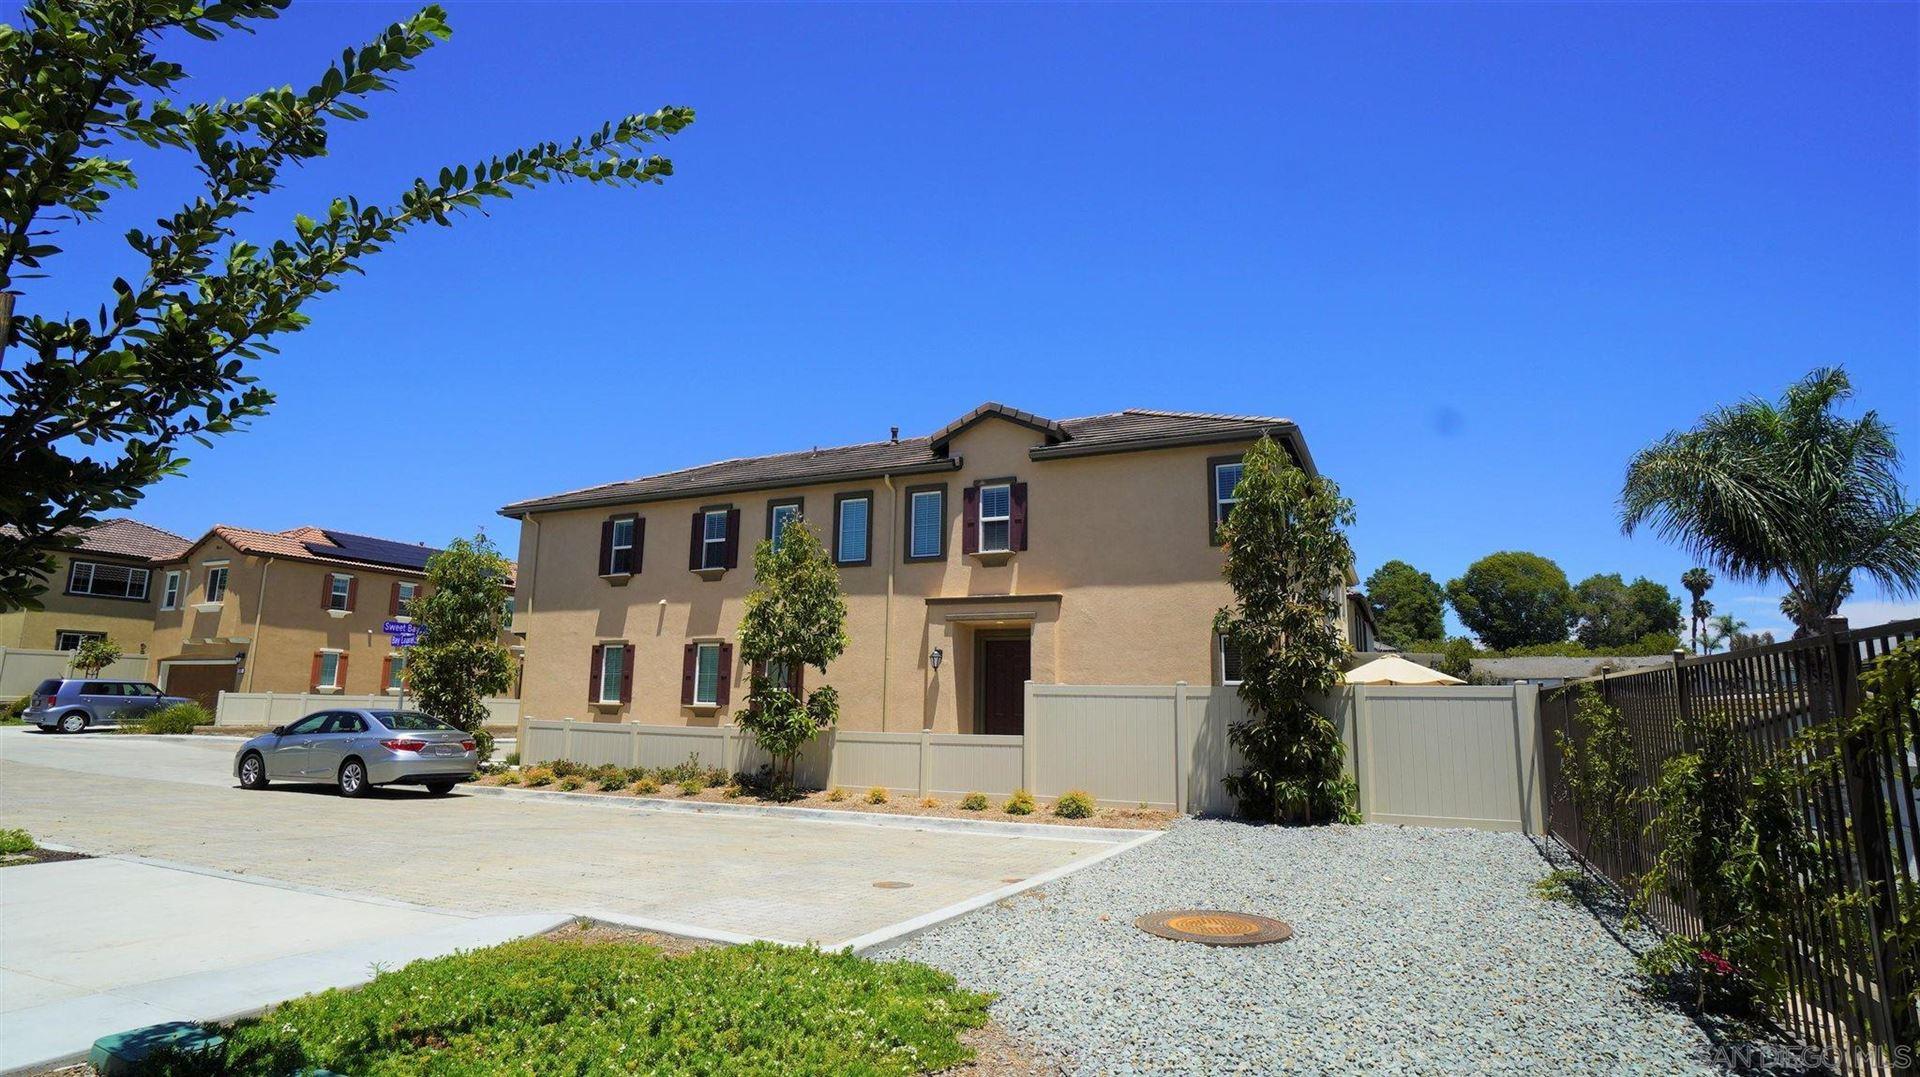 Photo of 232 Sweet Bay Ct, Vista, CA 92083 (MLS # 210015926)